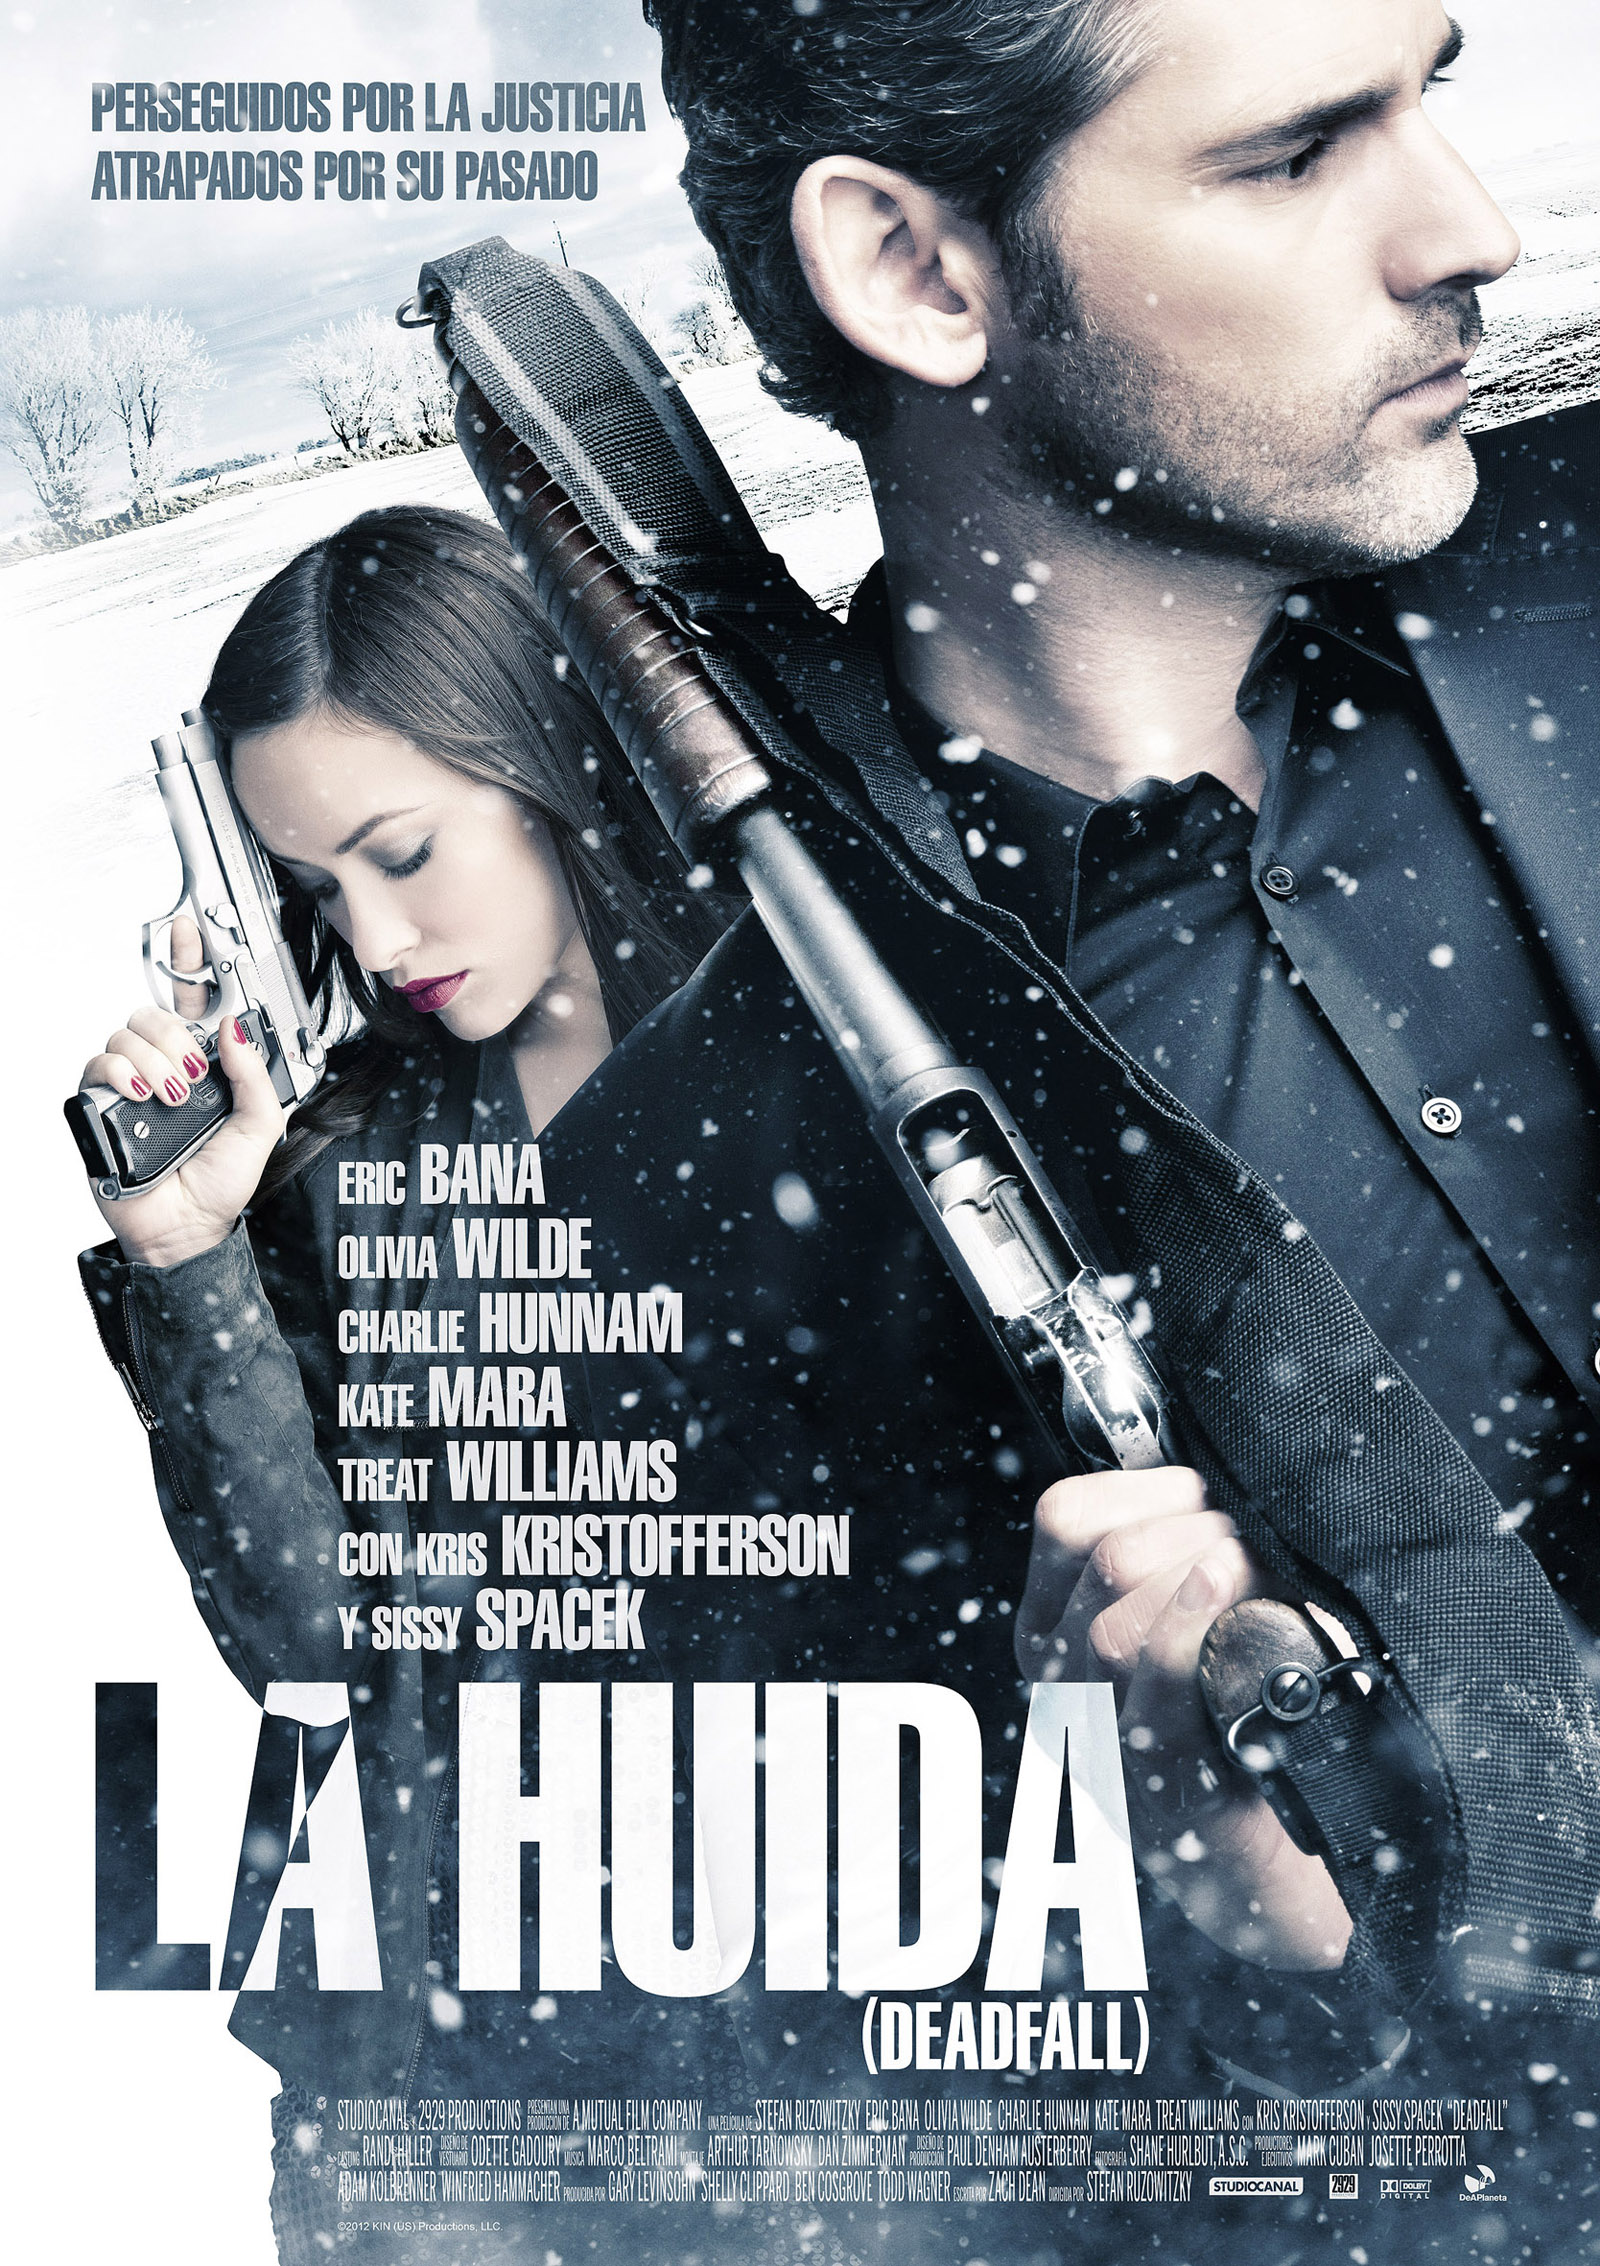 4d0edc3c33 La huida (Deadfall) - Película 2012 - SensaCine.com